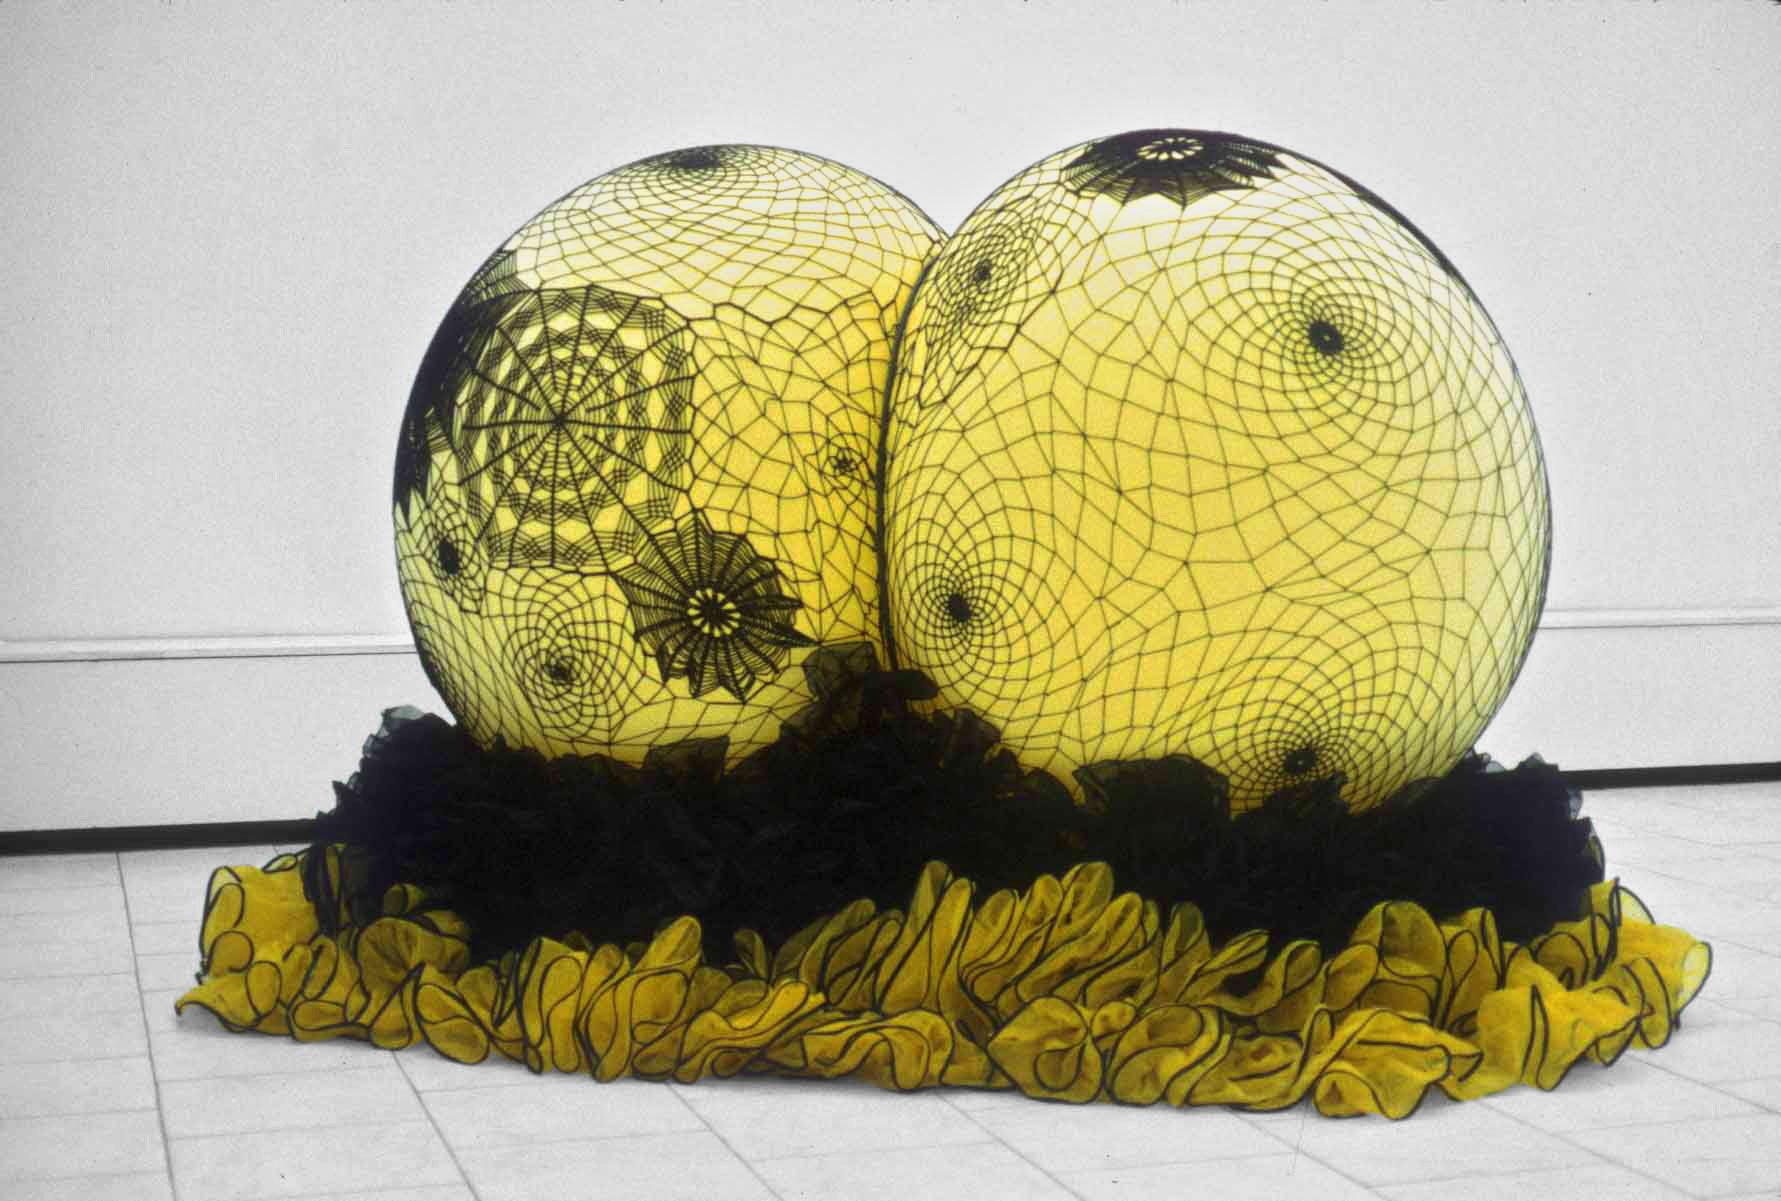 Nancy Davidson<br>Netella<br>1998<br>Latex, rope, fabric, plastic<br>55 x 90 x 60 in